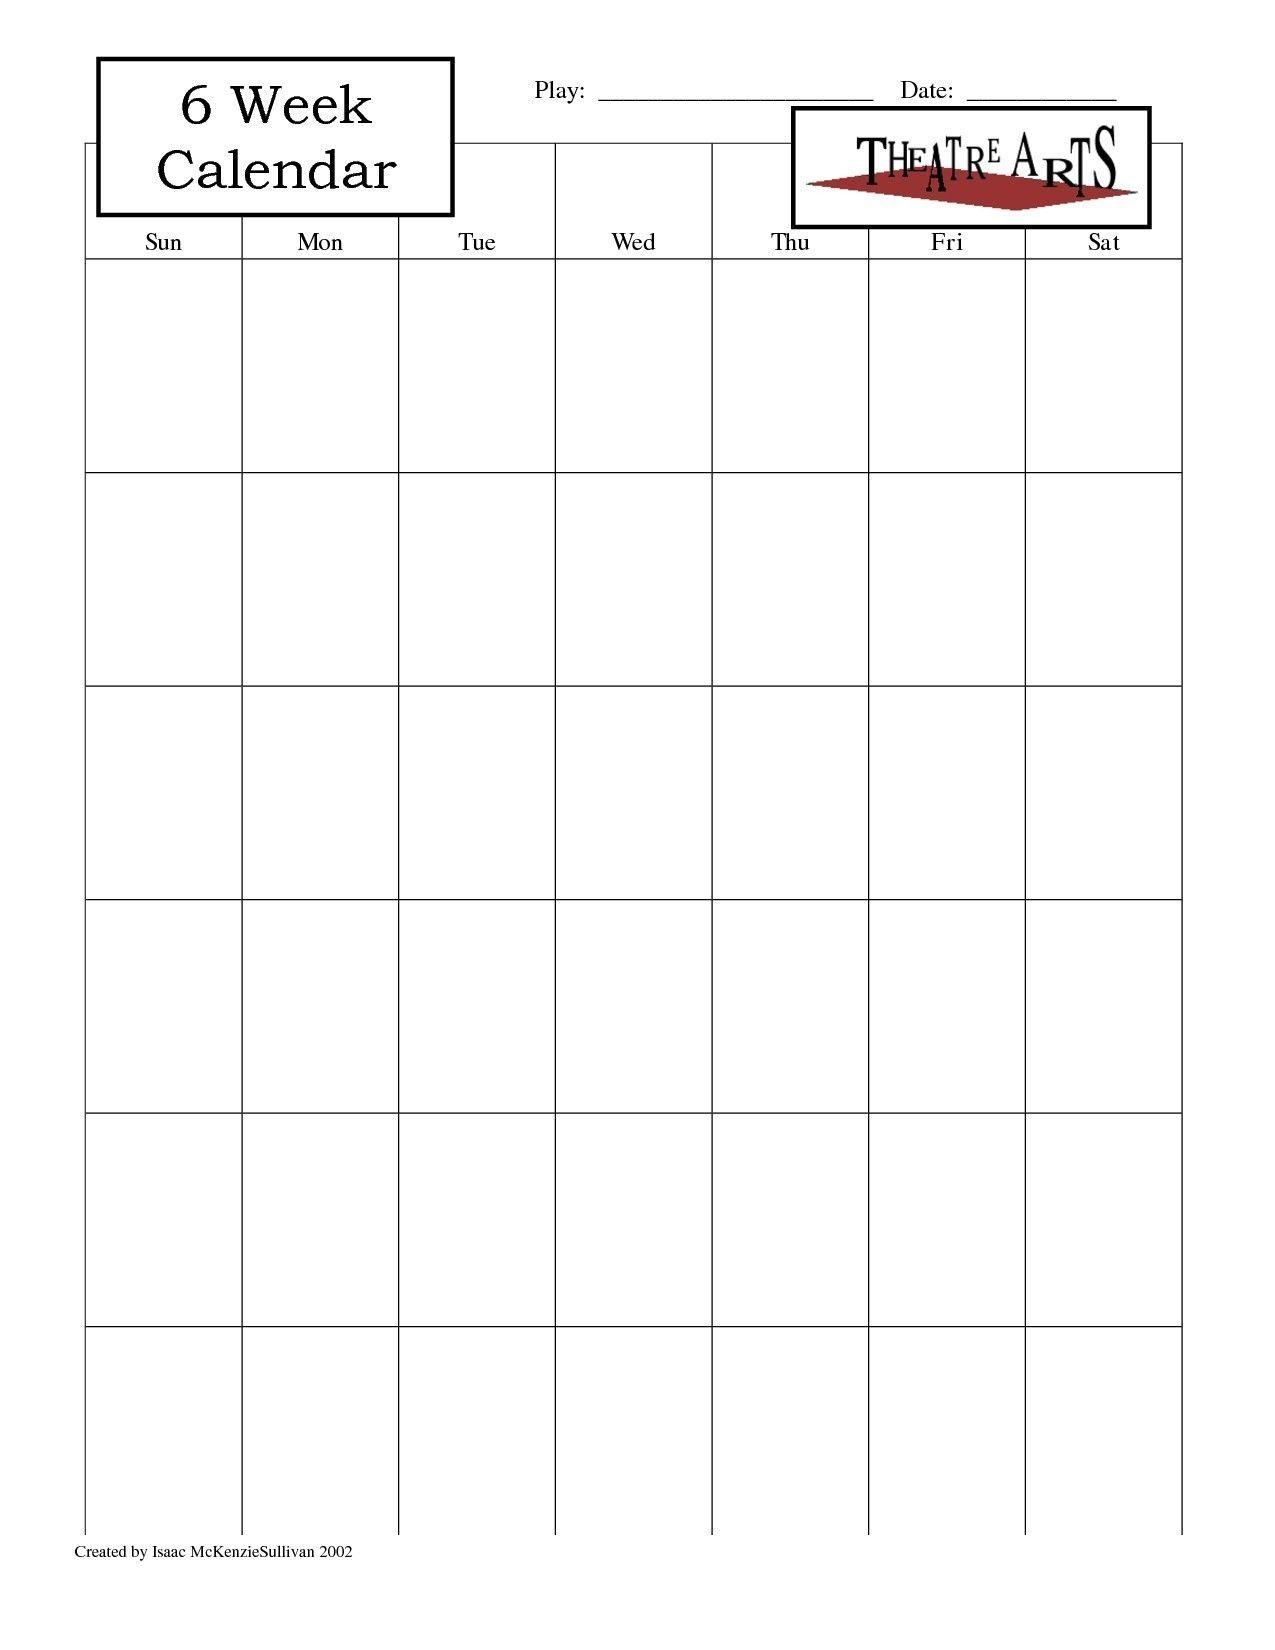 Pincalendar Printable Gee On New Calendar Printable